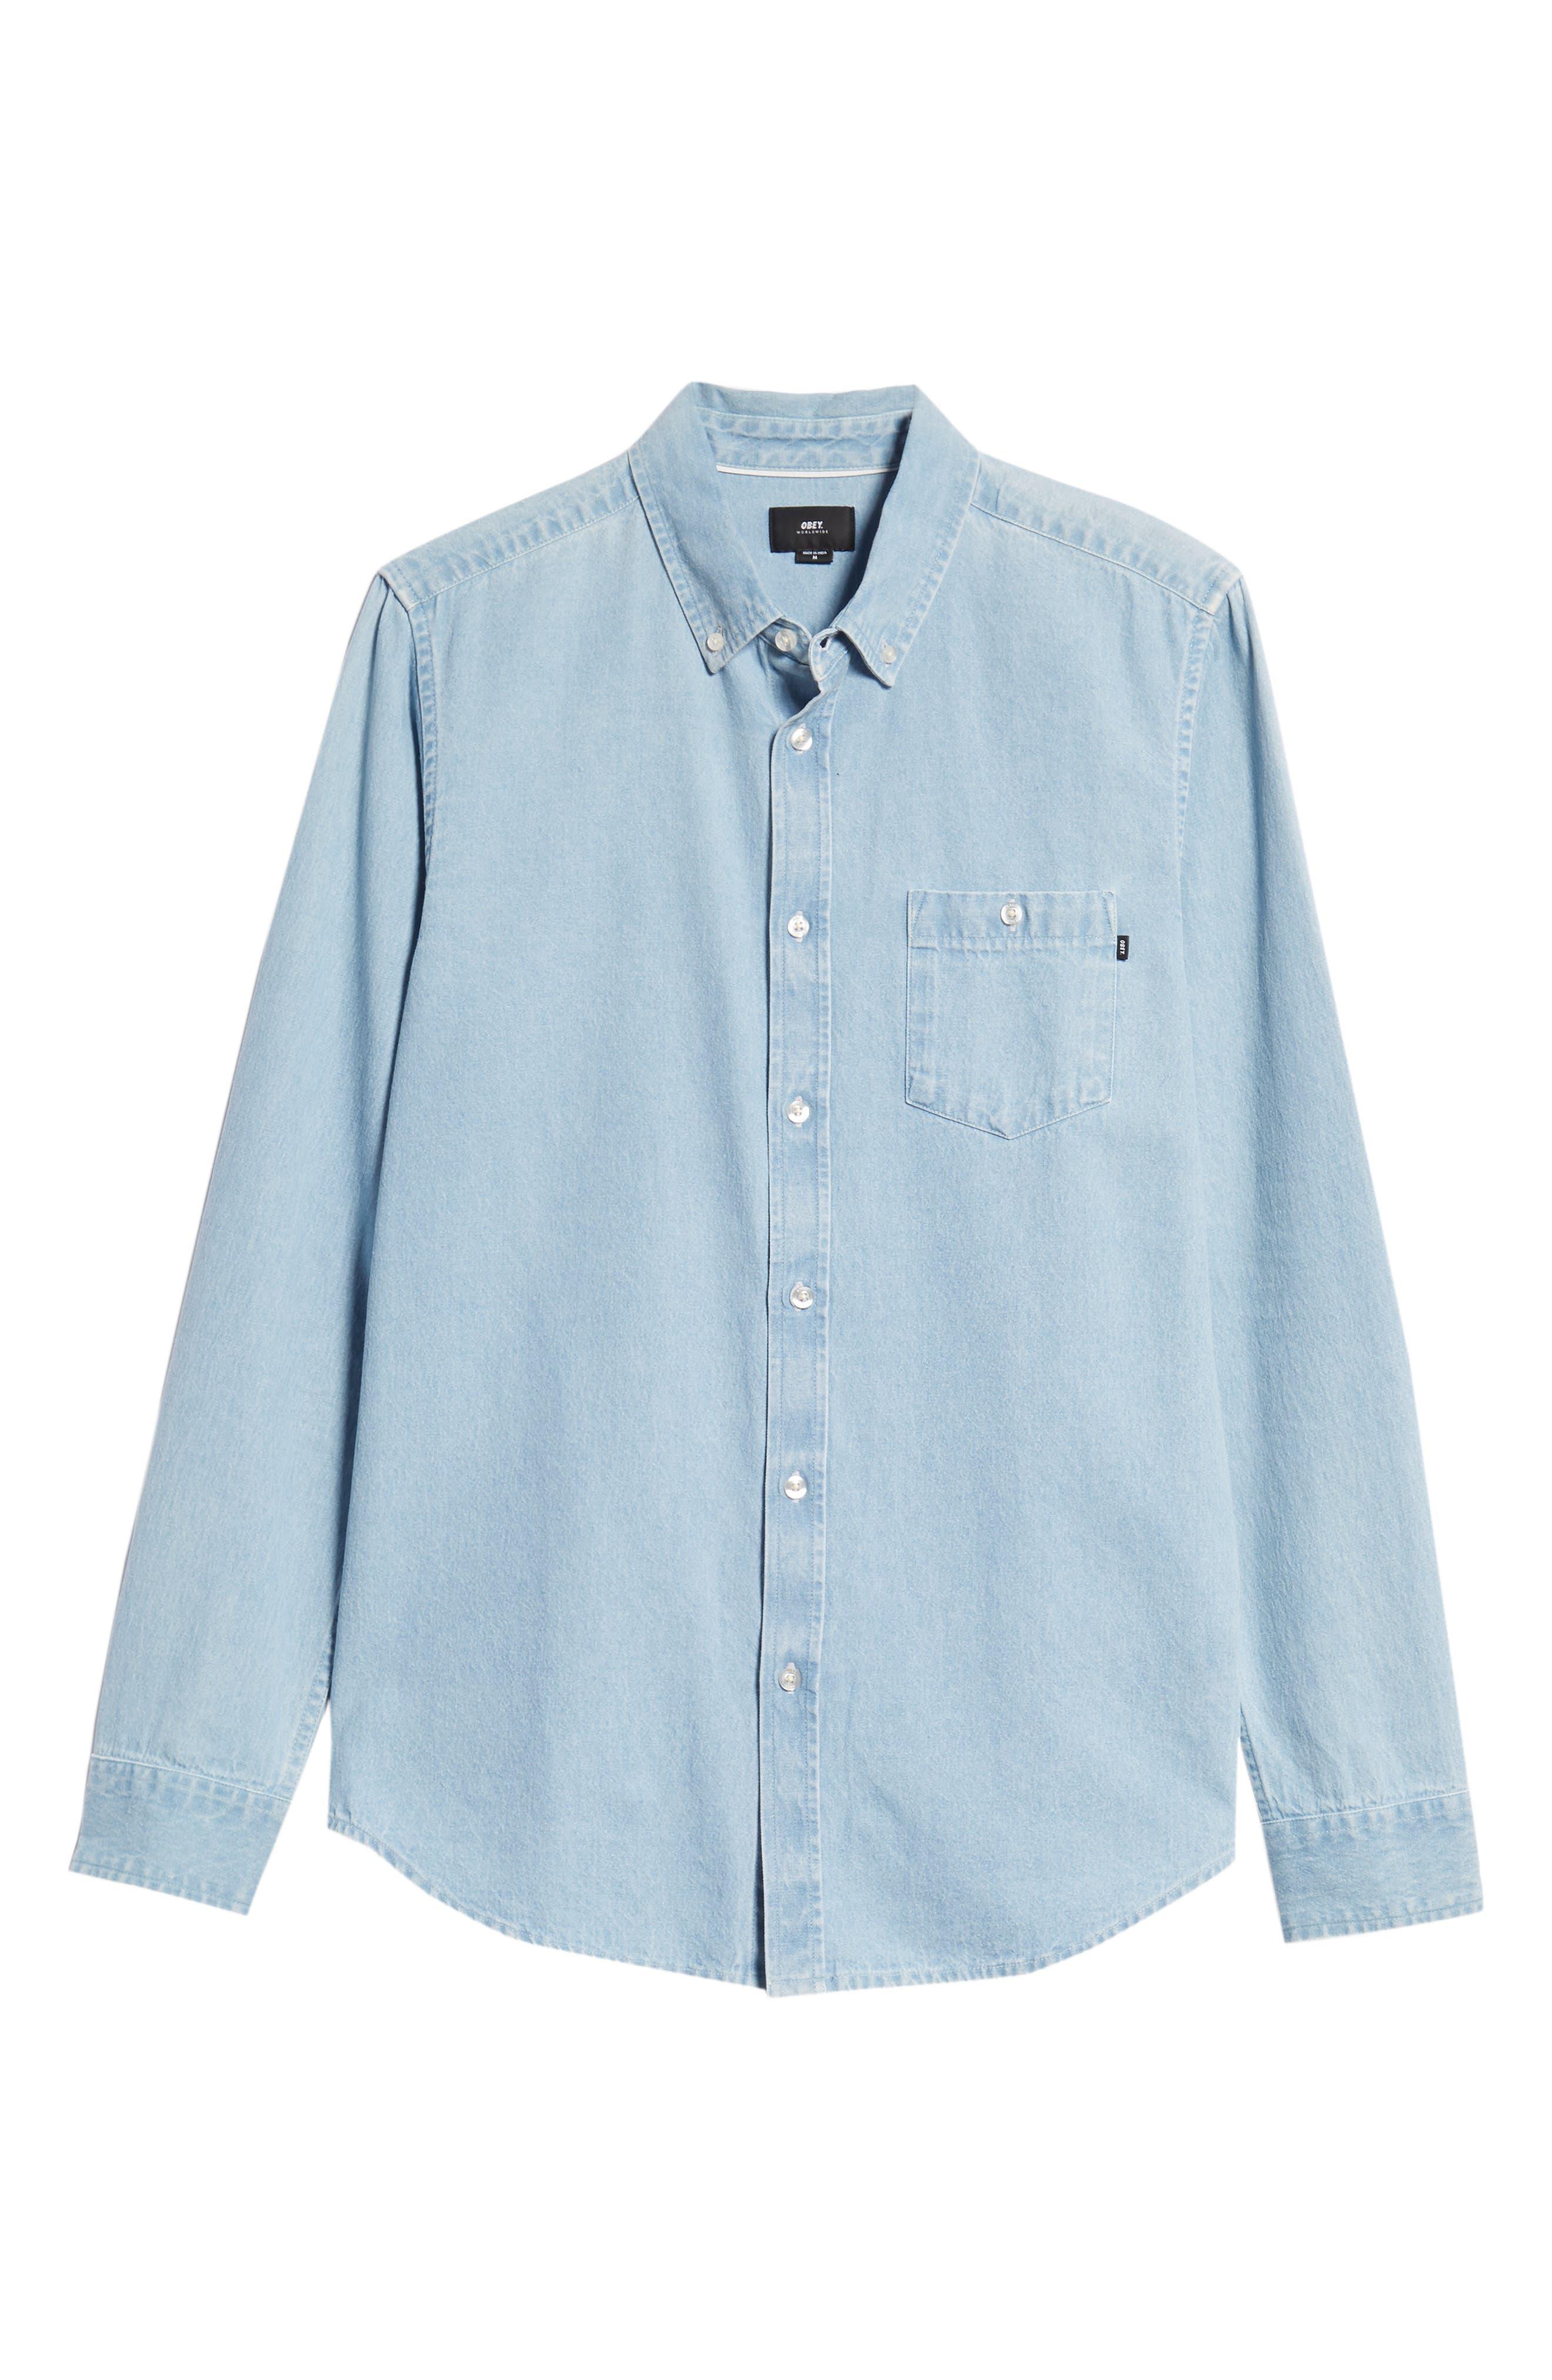 Keble Chambray Shirt,                             Alternate thumbnail 5, color,                             BLUE